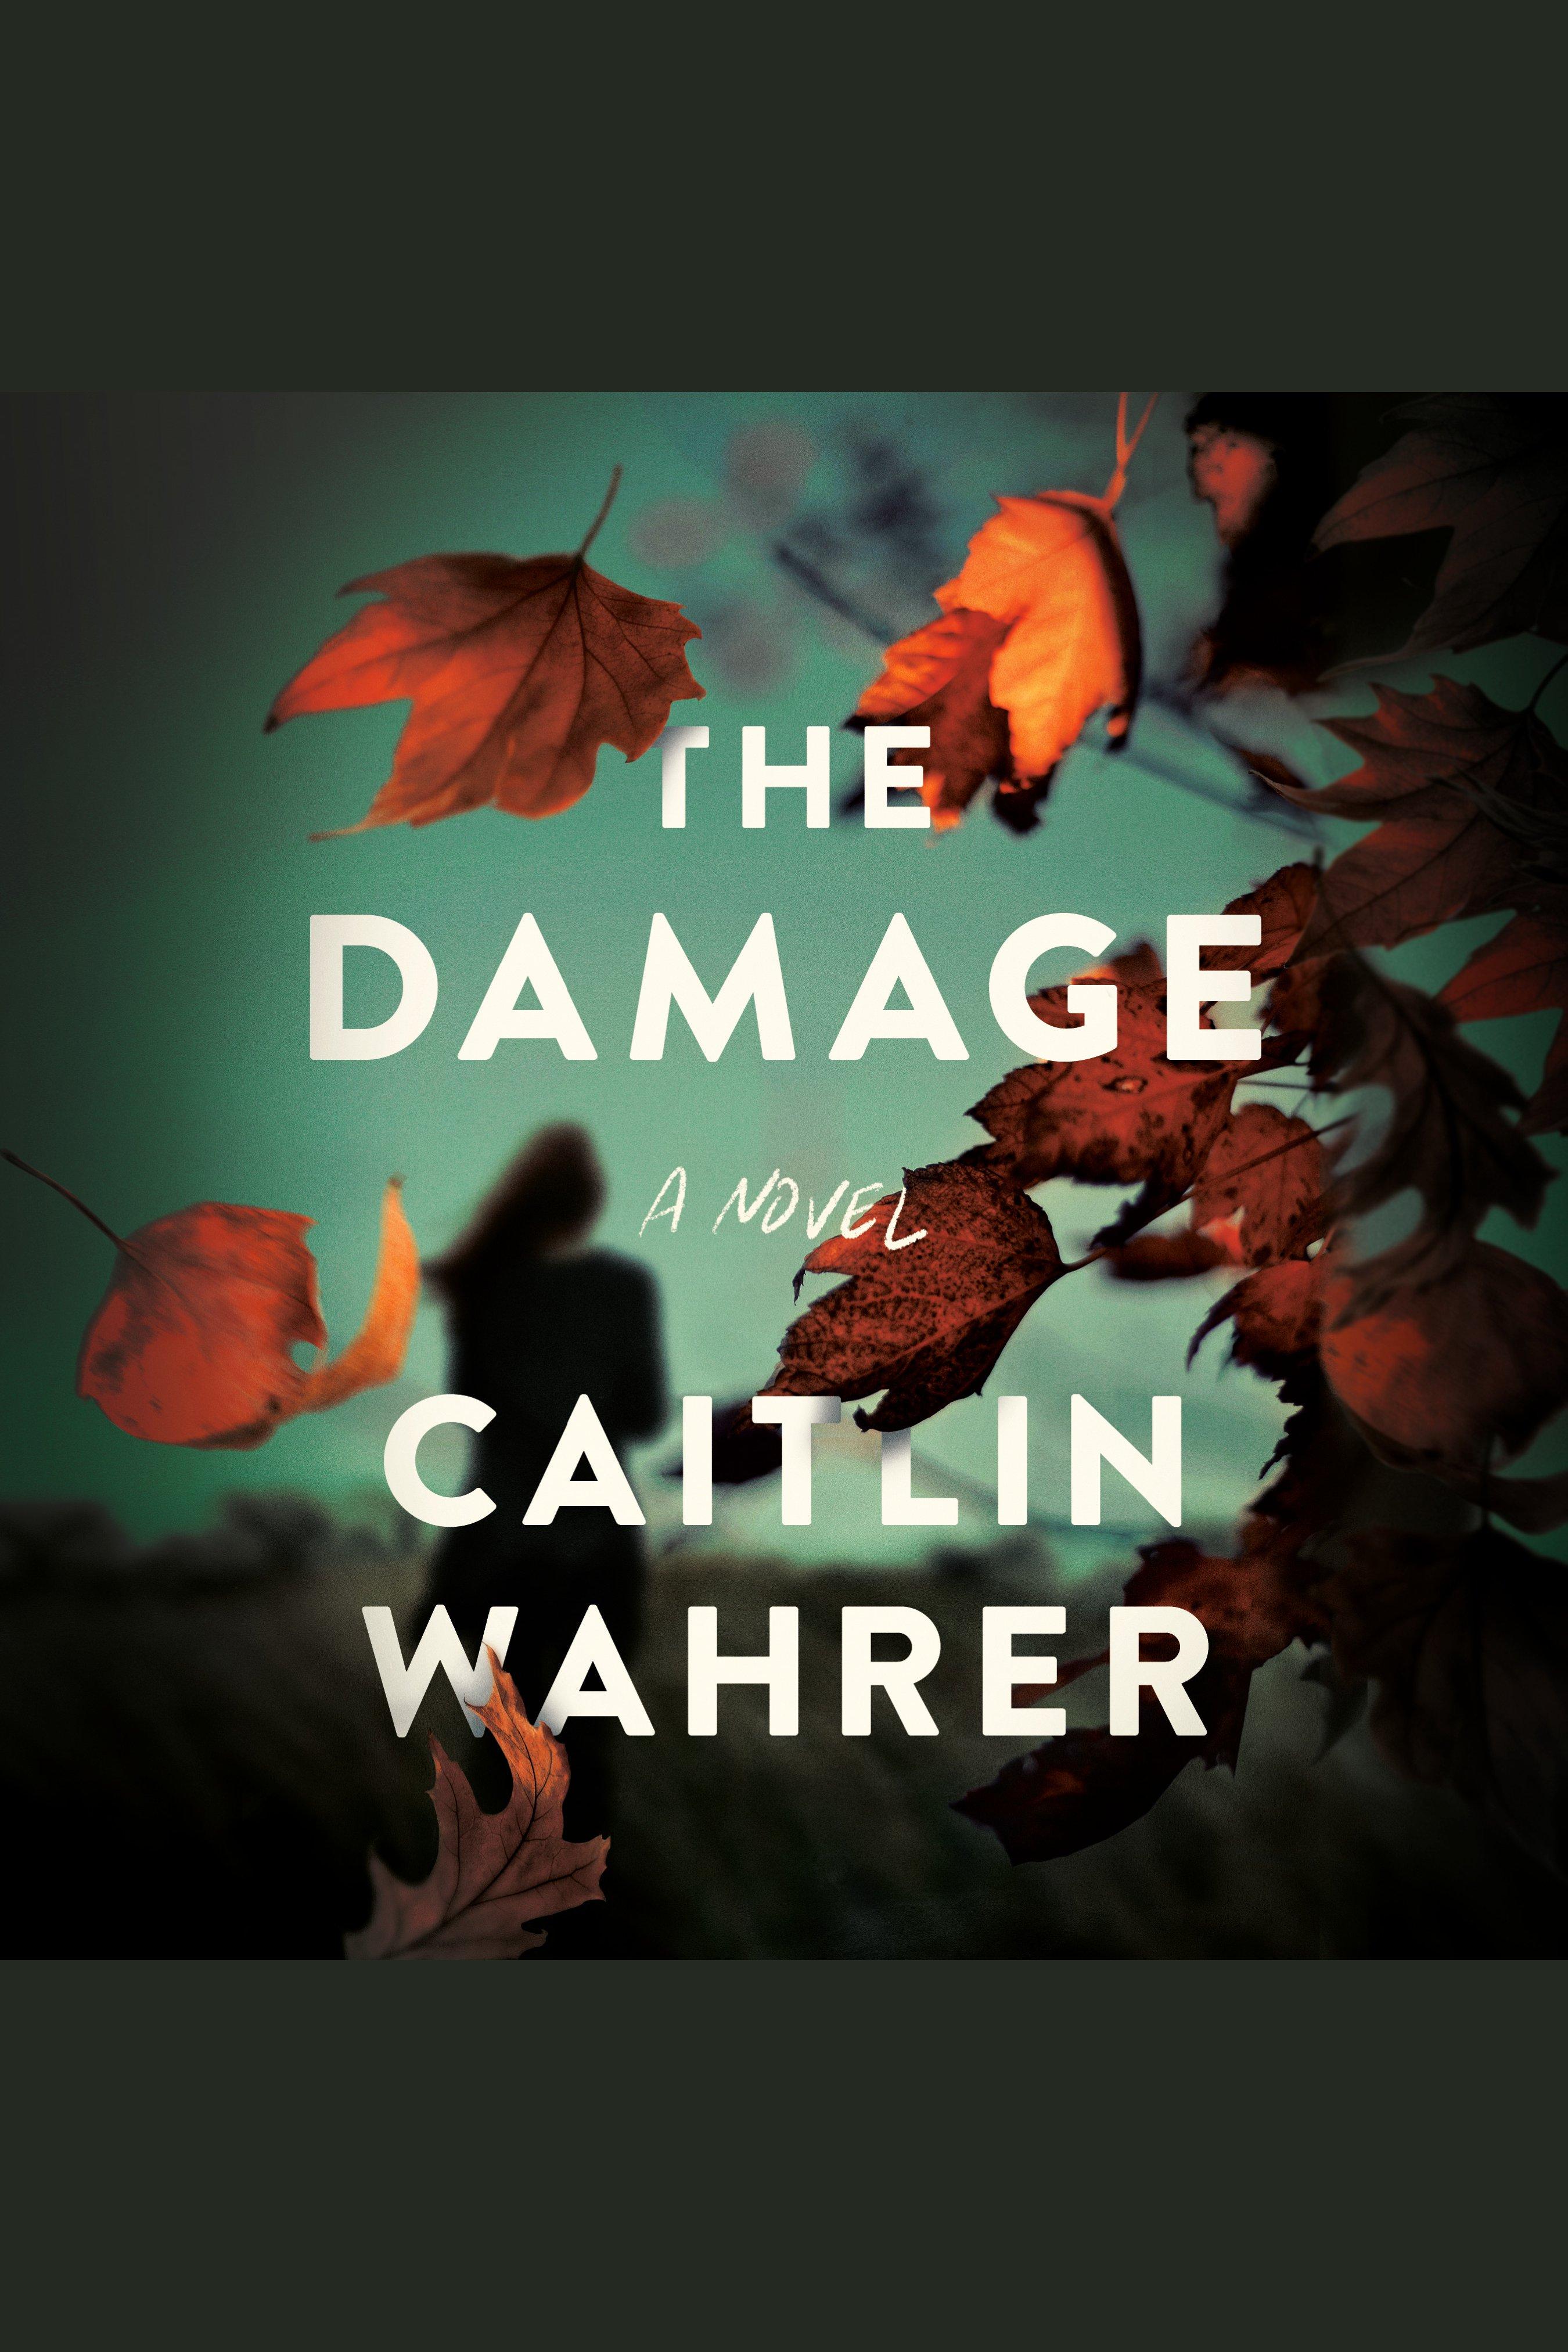 Damage, The A Novel